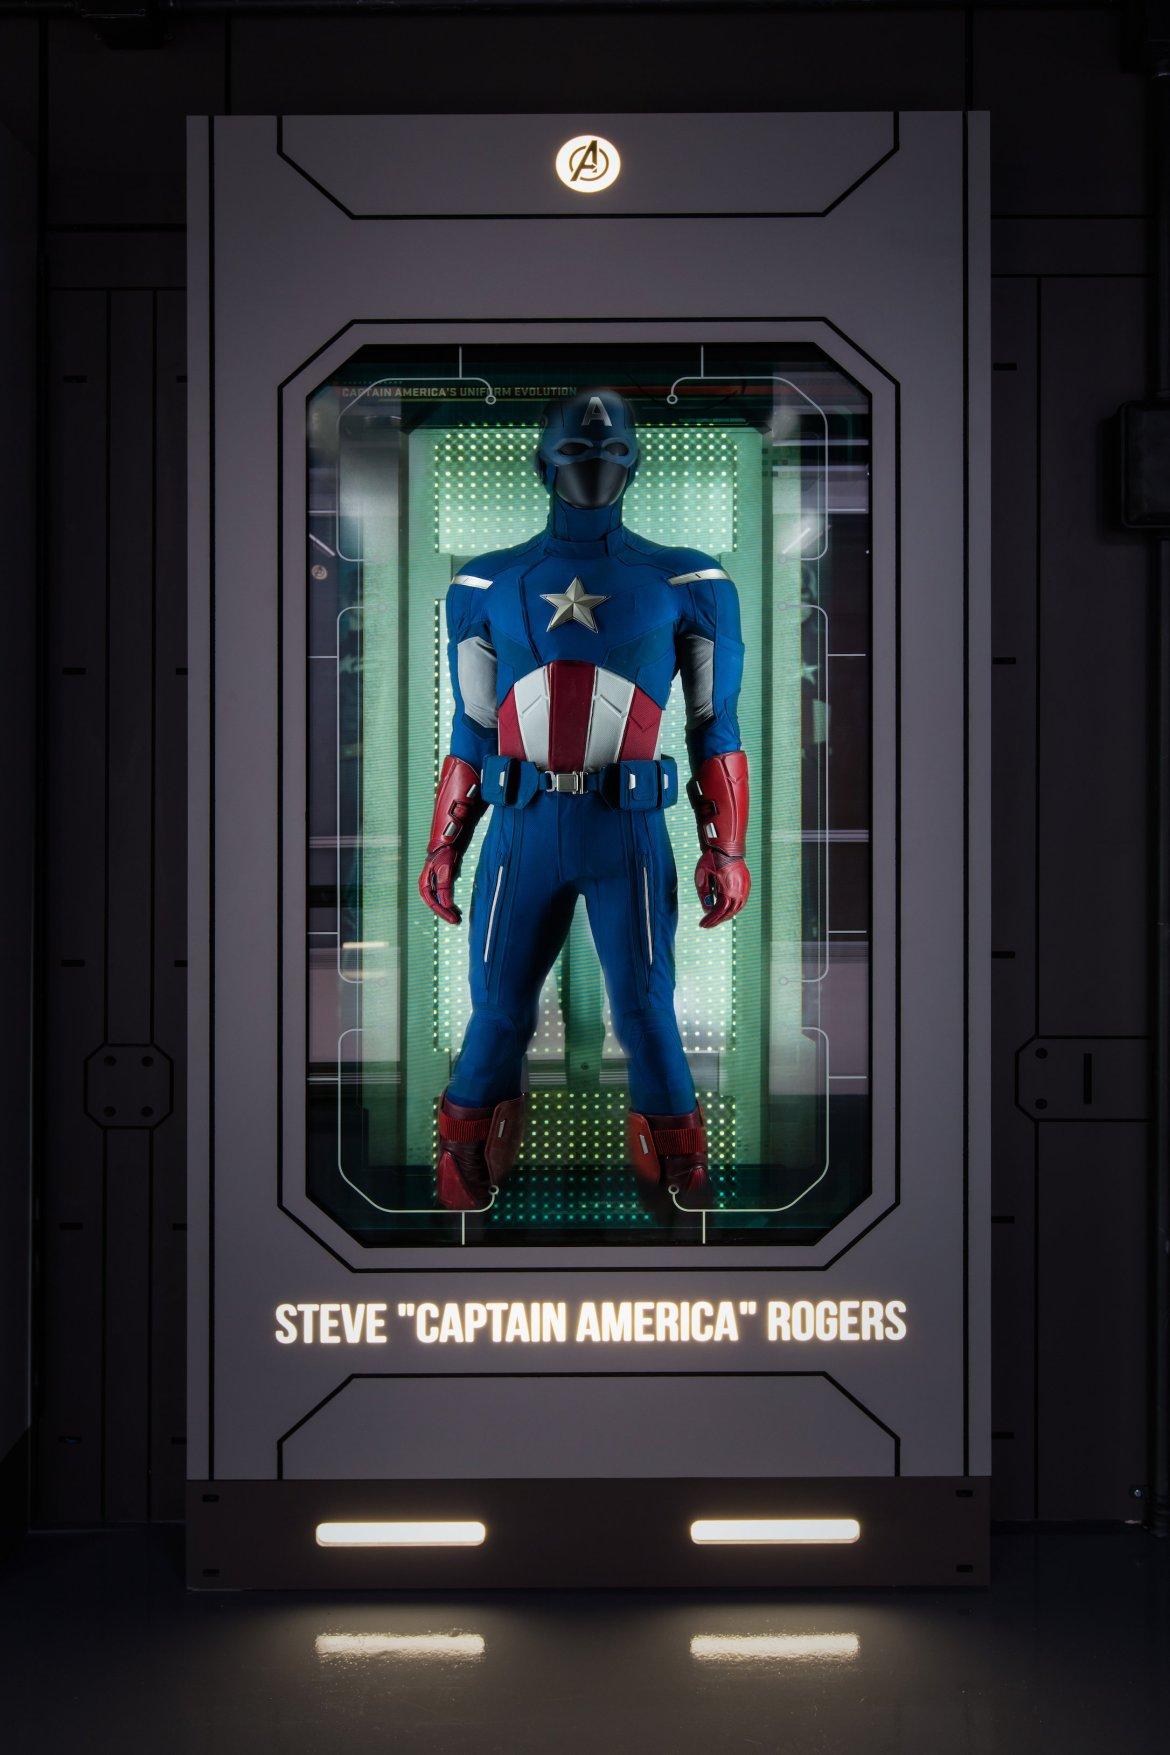 S.t.a.t.i.o.n. steve captain america rogers